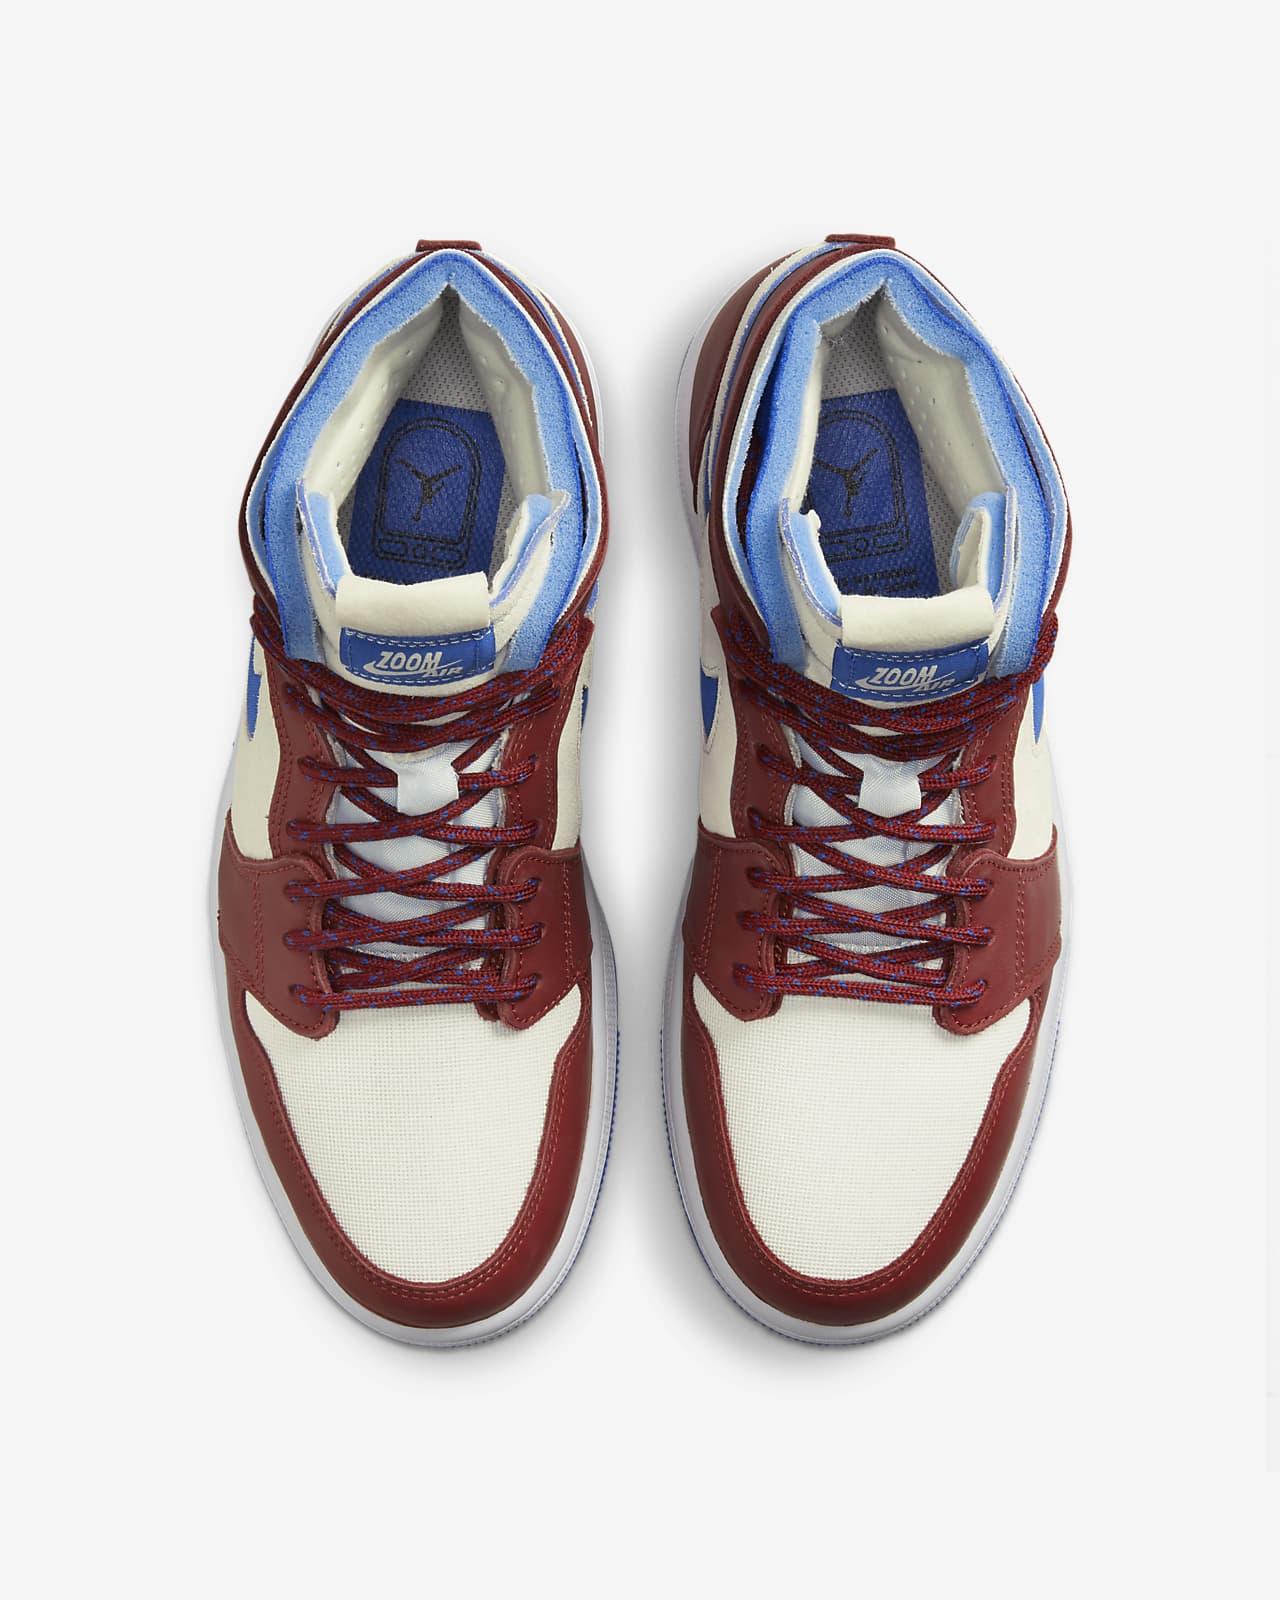 Chaussure Air Jordan 1 Zoom Air Comfort pour Femme. Nike LU